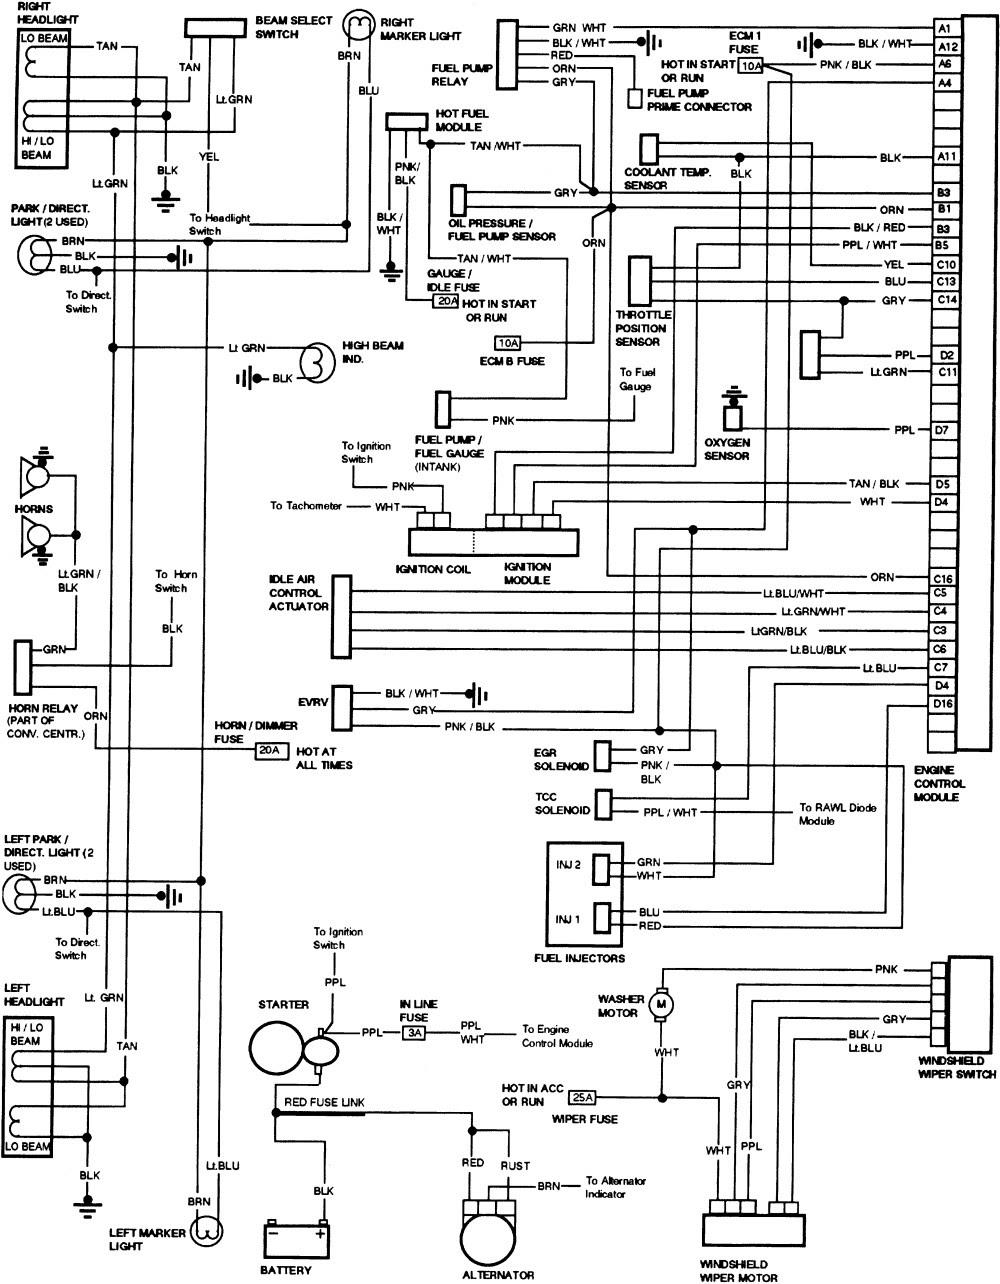 1983 Chevy Wiring Diagram 1995 Chevy Lumina Stereo Wiring Diagram Bege Wiring Diagram